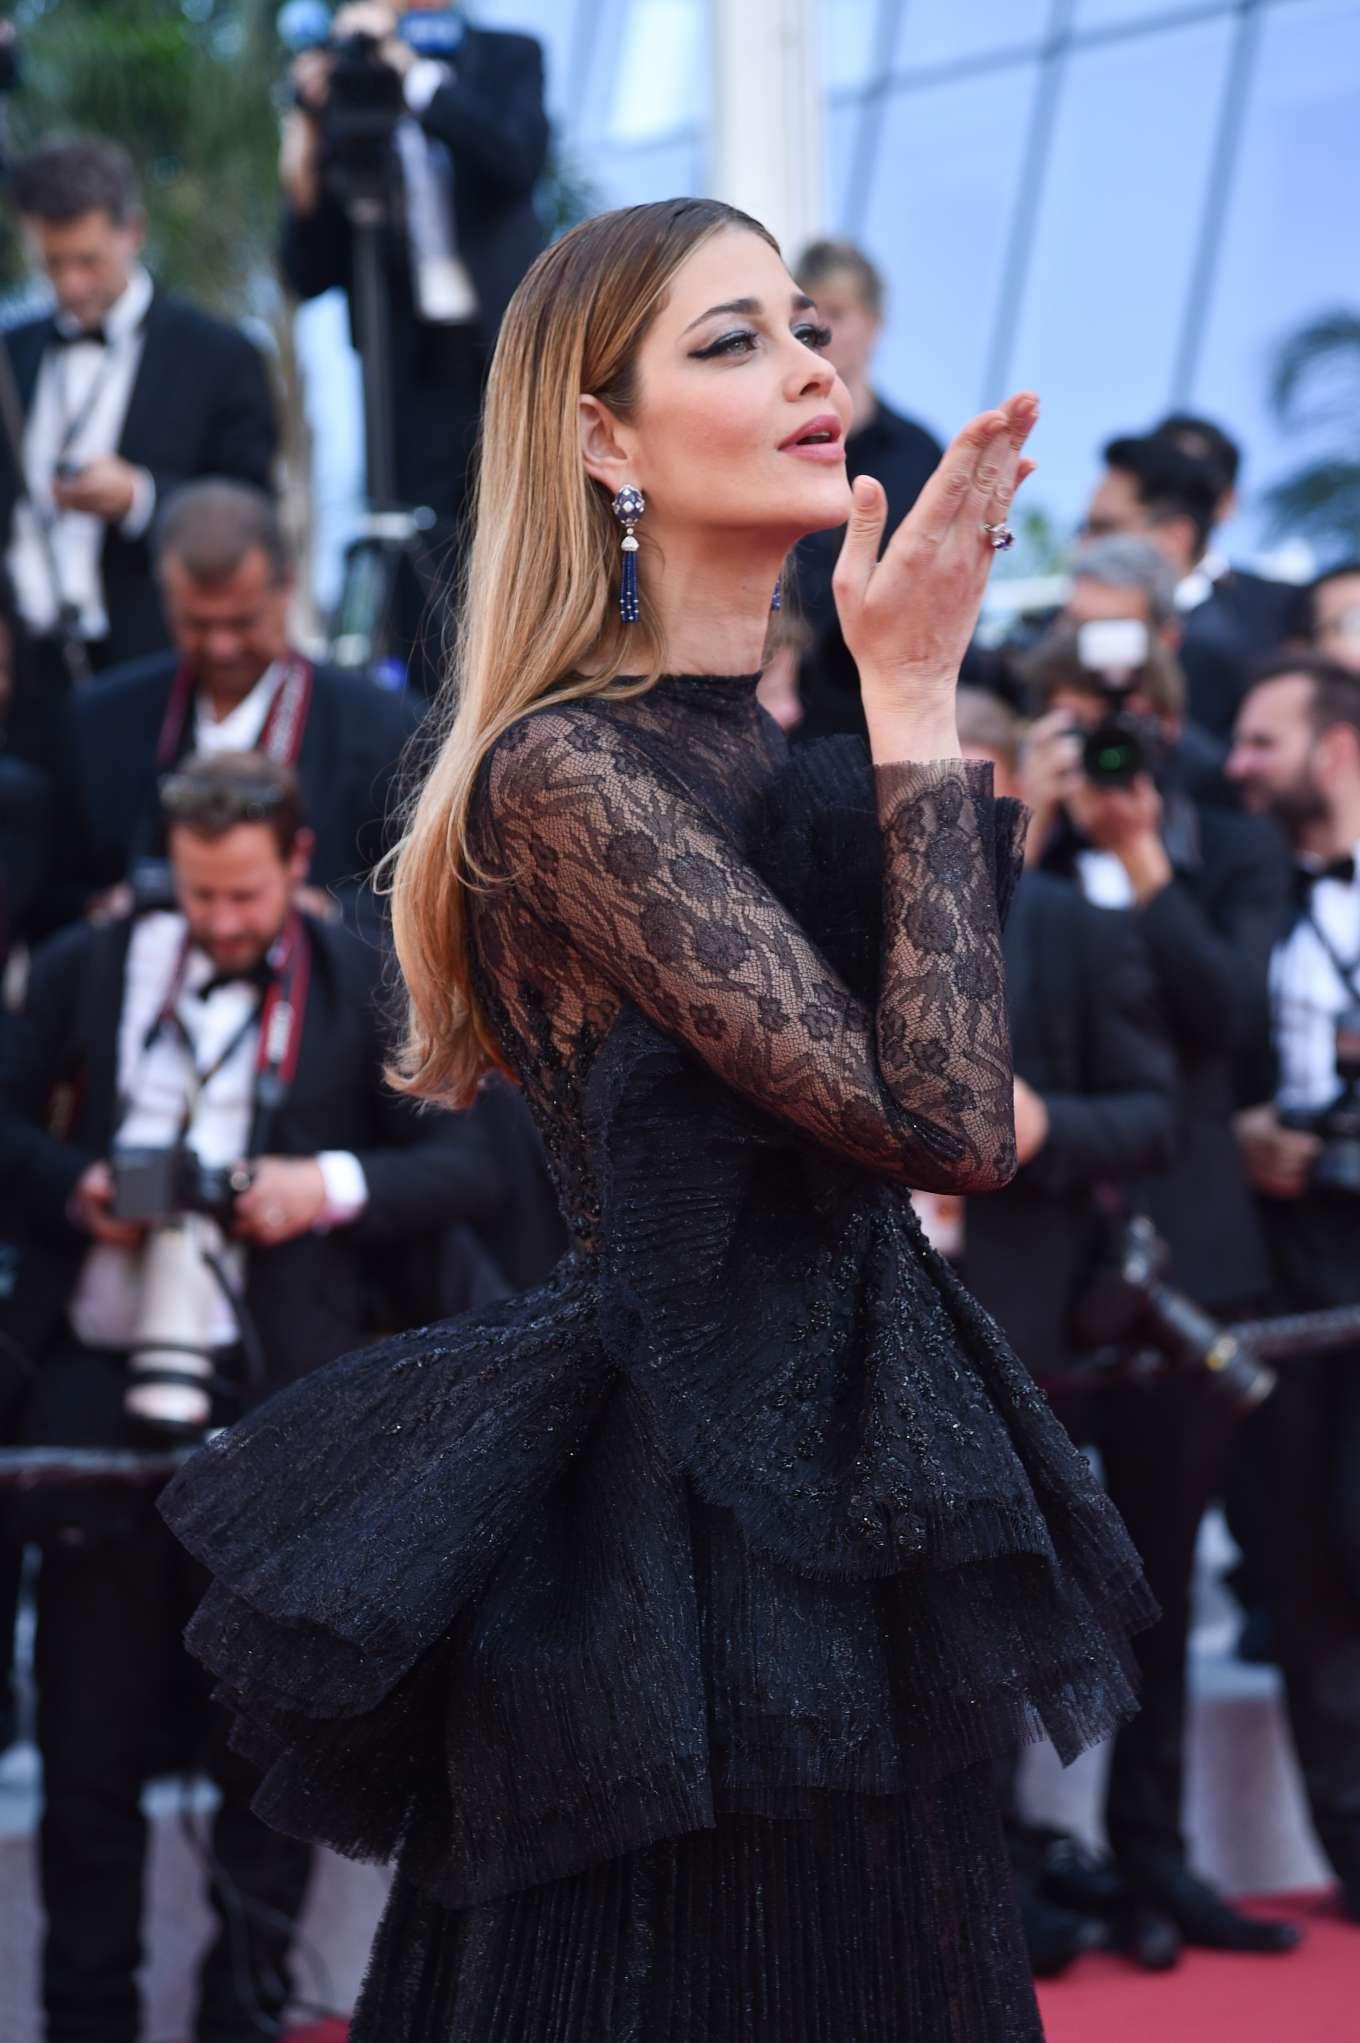 Ana Beatriz Barros 2019 : Ana Beatriz Barros: The Traitor Premiere at 2019 Cannes Film Festival-12